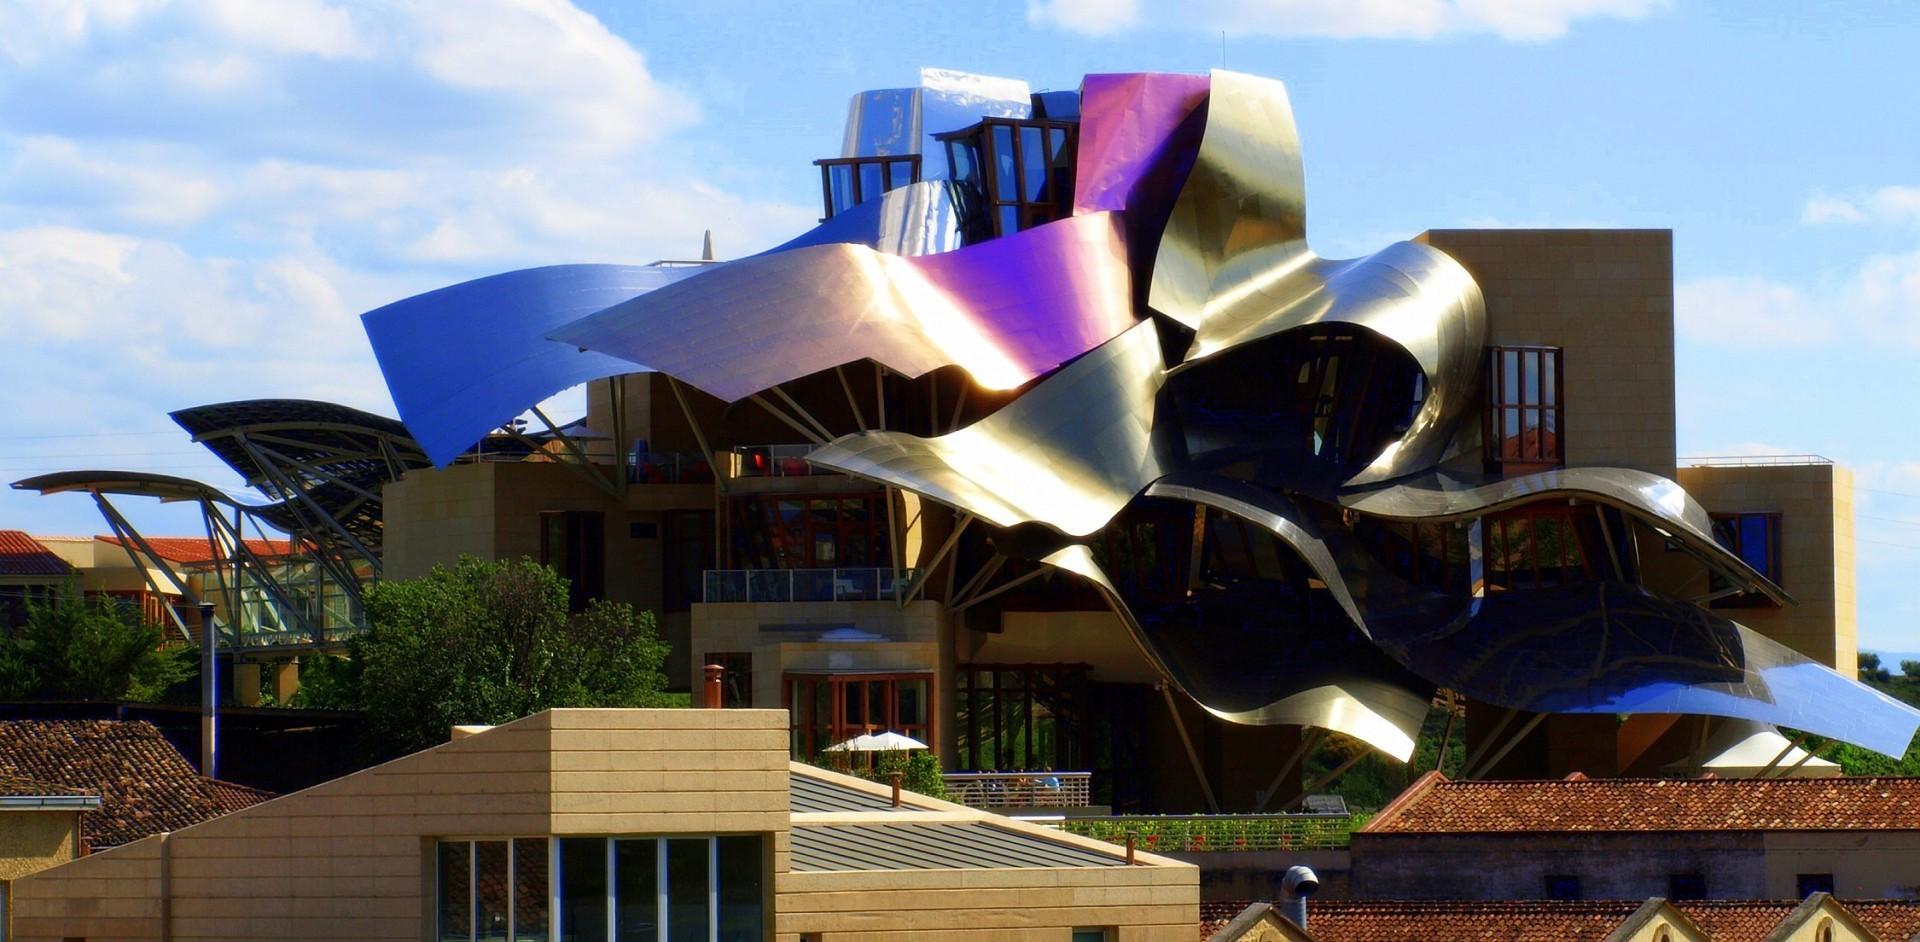 Los 8 hoteles m s raros del mundo p gina 2 foro de viajes - Arquitecto bodegas marques de riscal ...